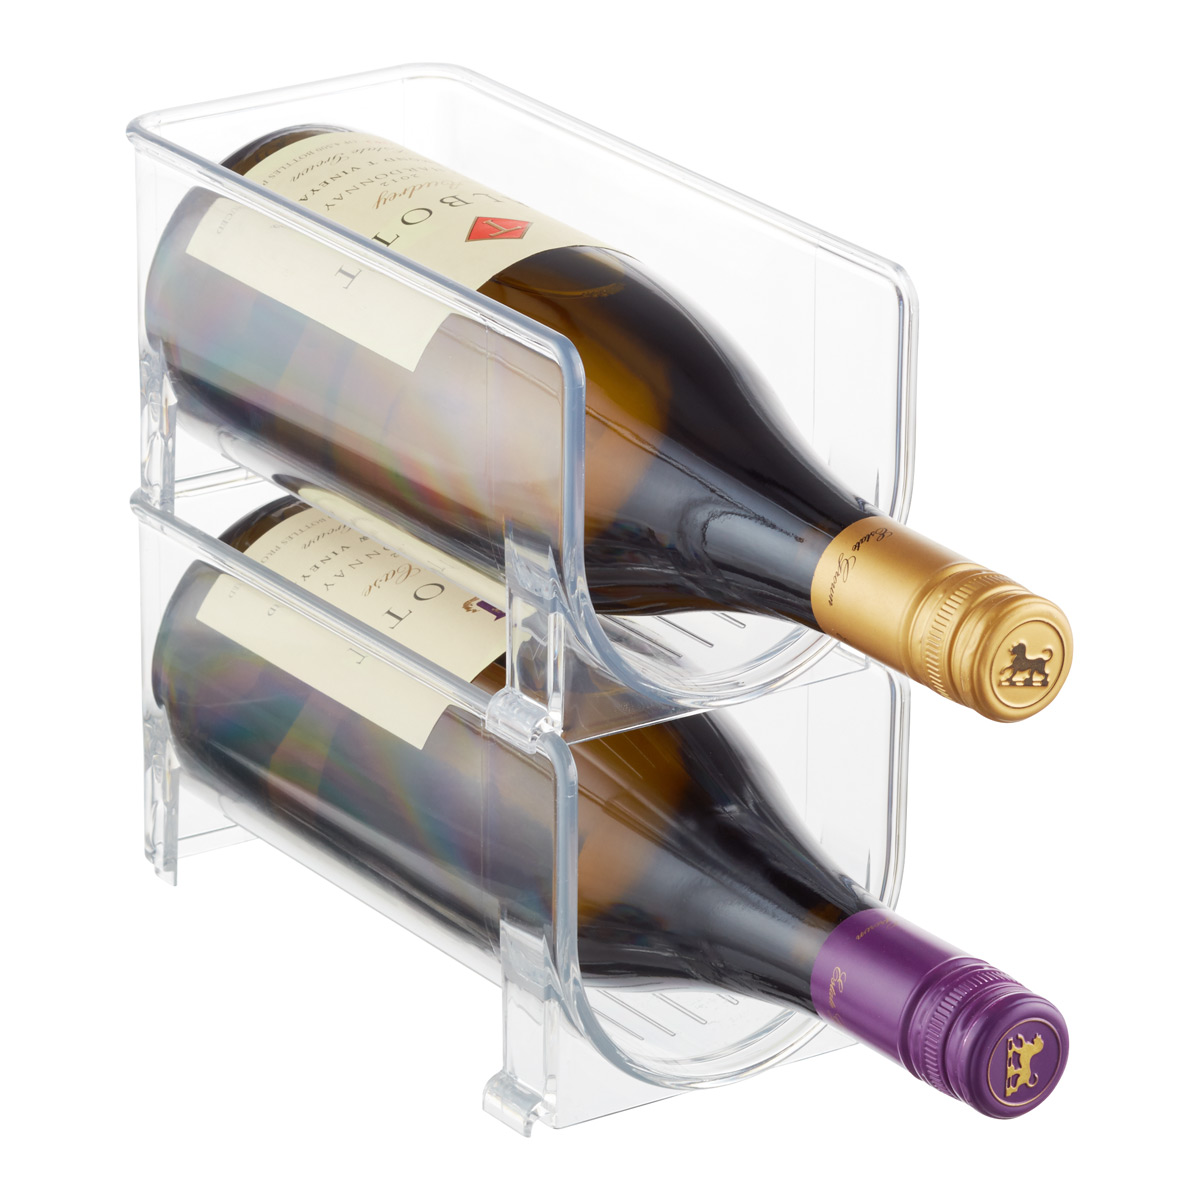 idesign linus fridge bins wine holder